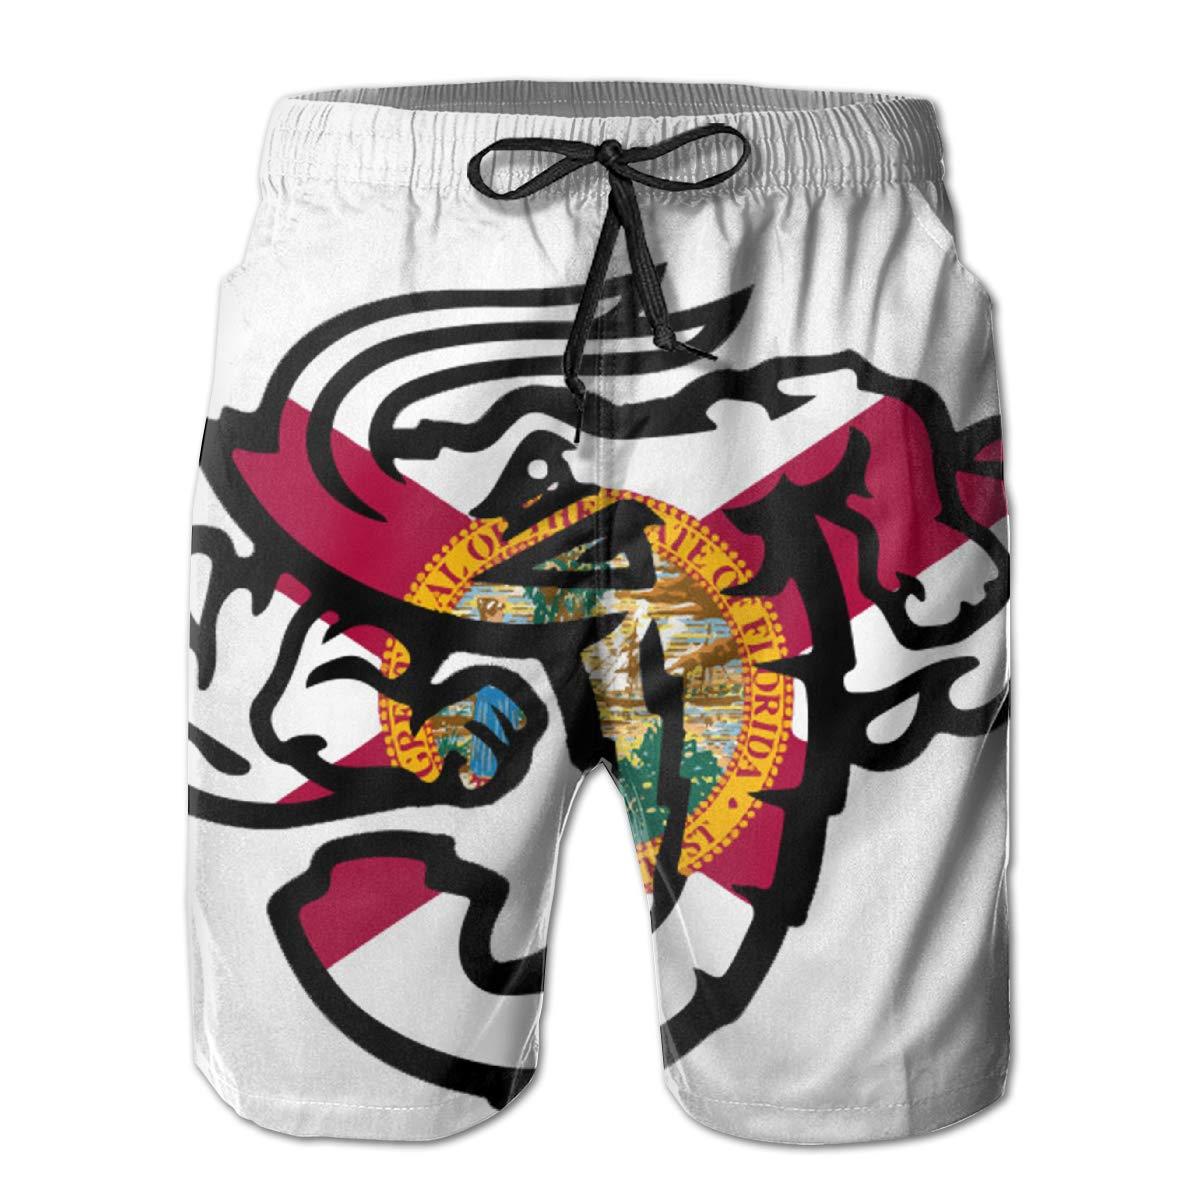 HZamora/_H Mens Jacksonville Jumbo Shrimp Florida Flag Summer Breathable Quick-Drying Swim Trunks Beach Shorts Cargo Shorts L